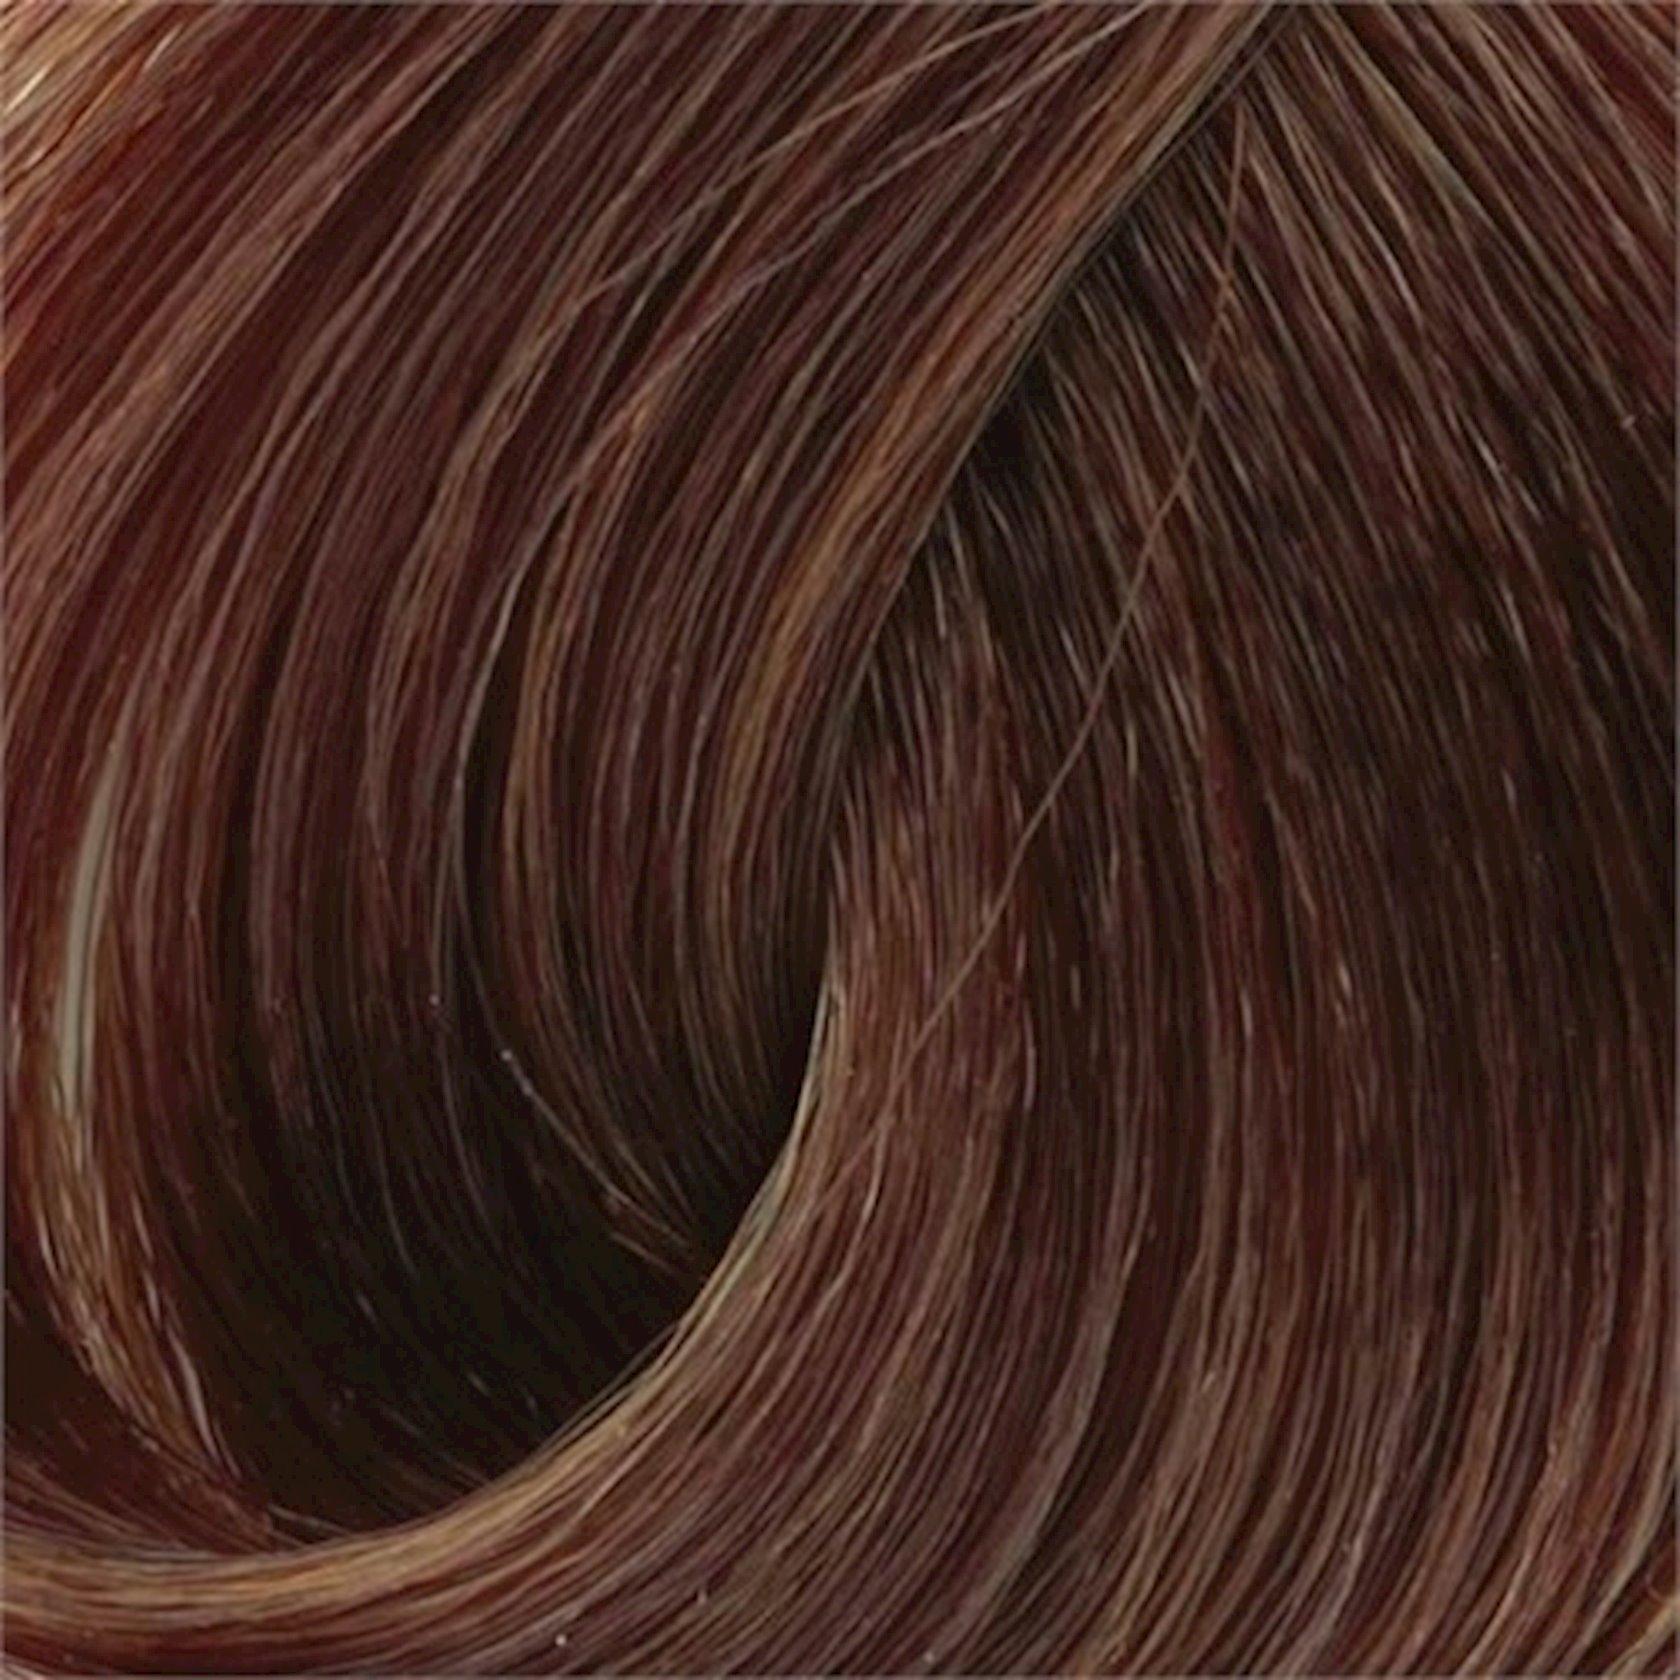 Saç üçün qalıcı krem boya Exicolor Permanent Hair Color Cream 100 ml №6.3 Fındık Kabuğu, Fındıq qabığı